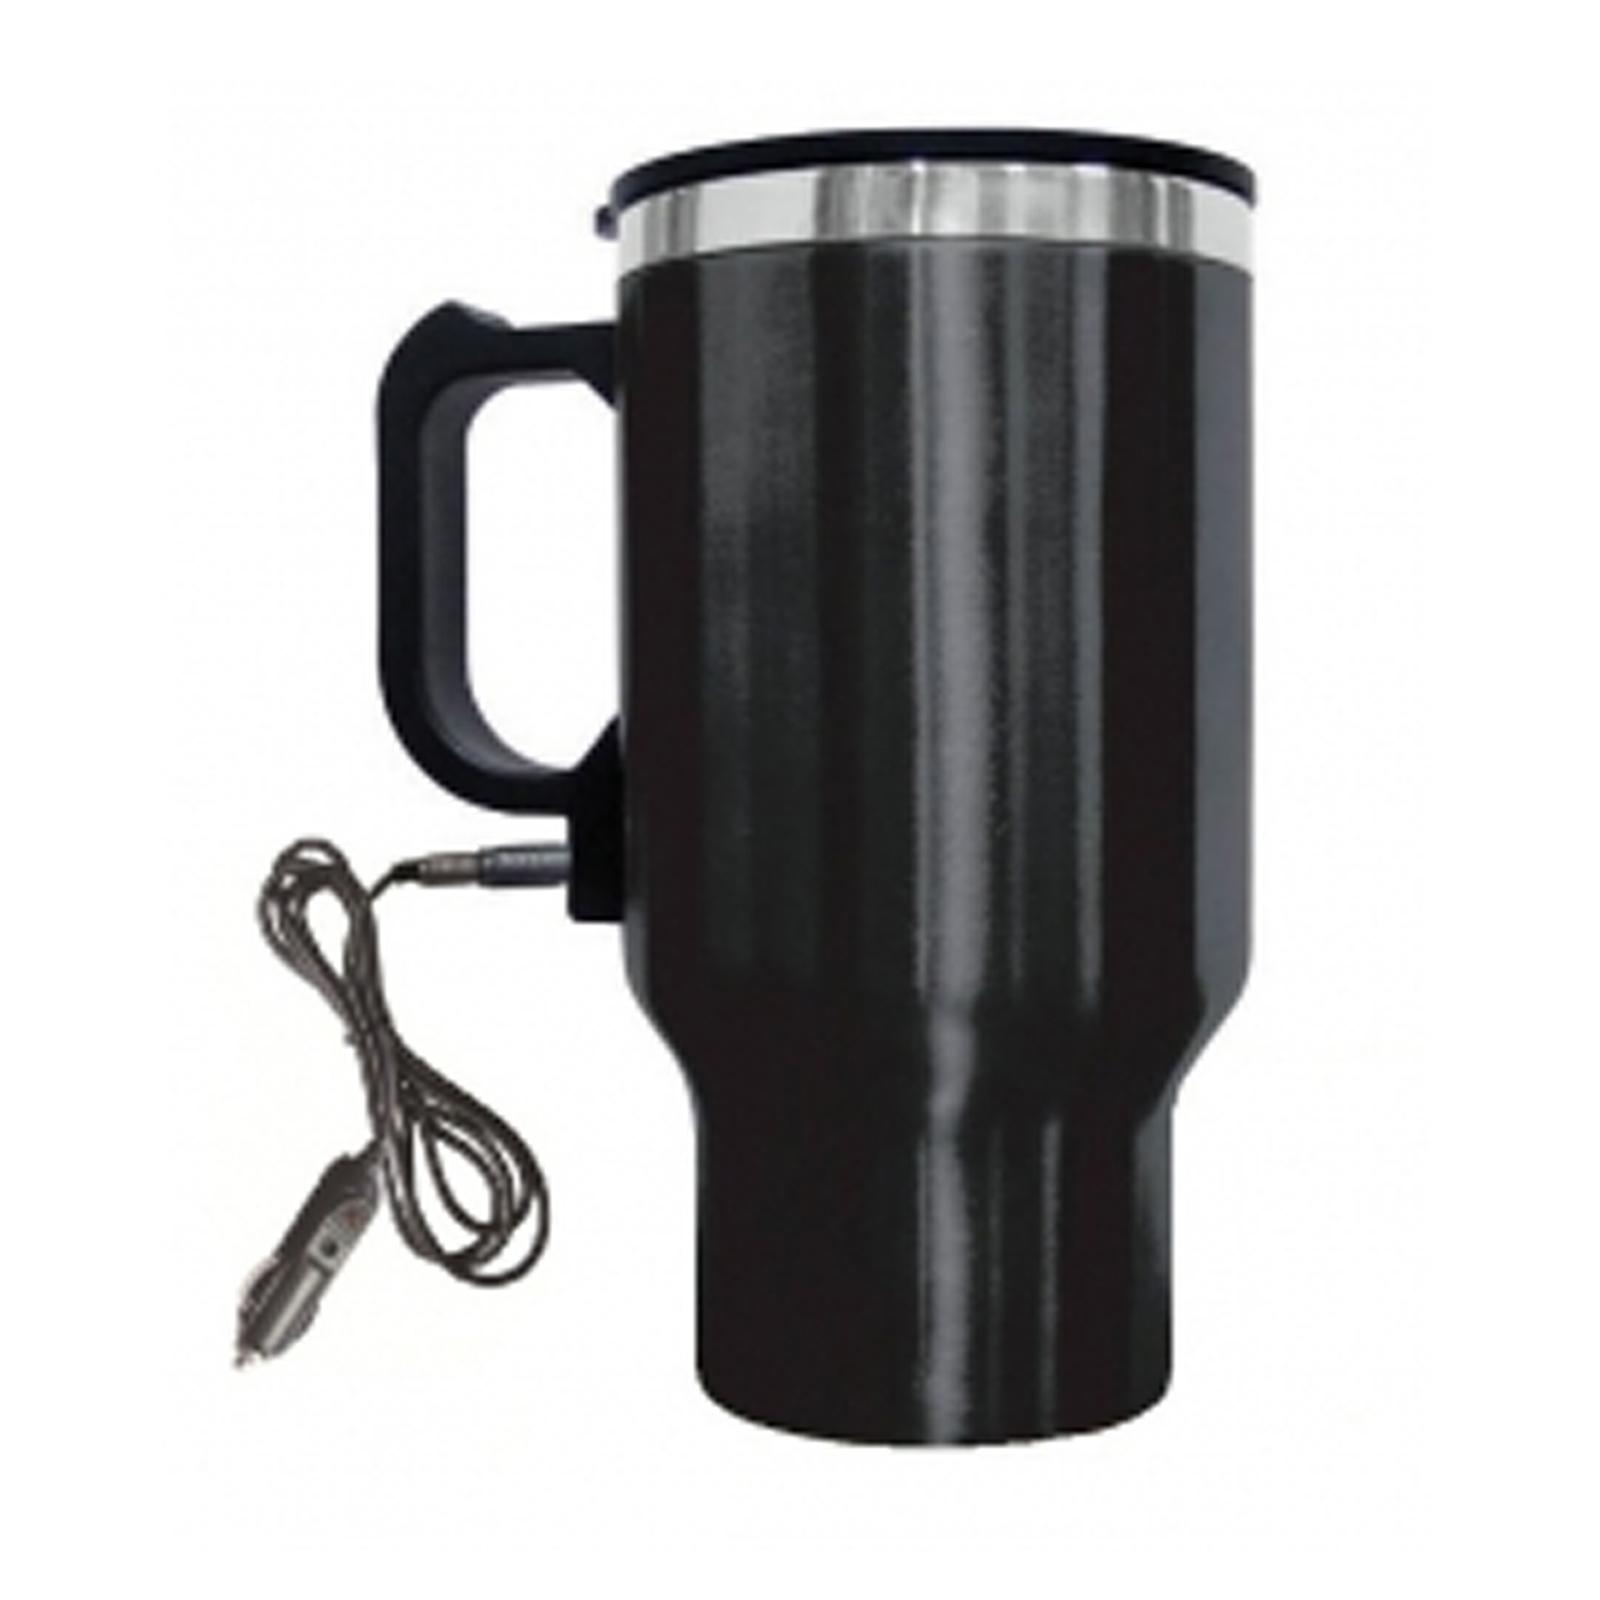 Brentwood Electric Coffee Mug with Wire Car Plug